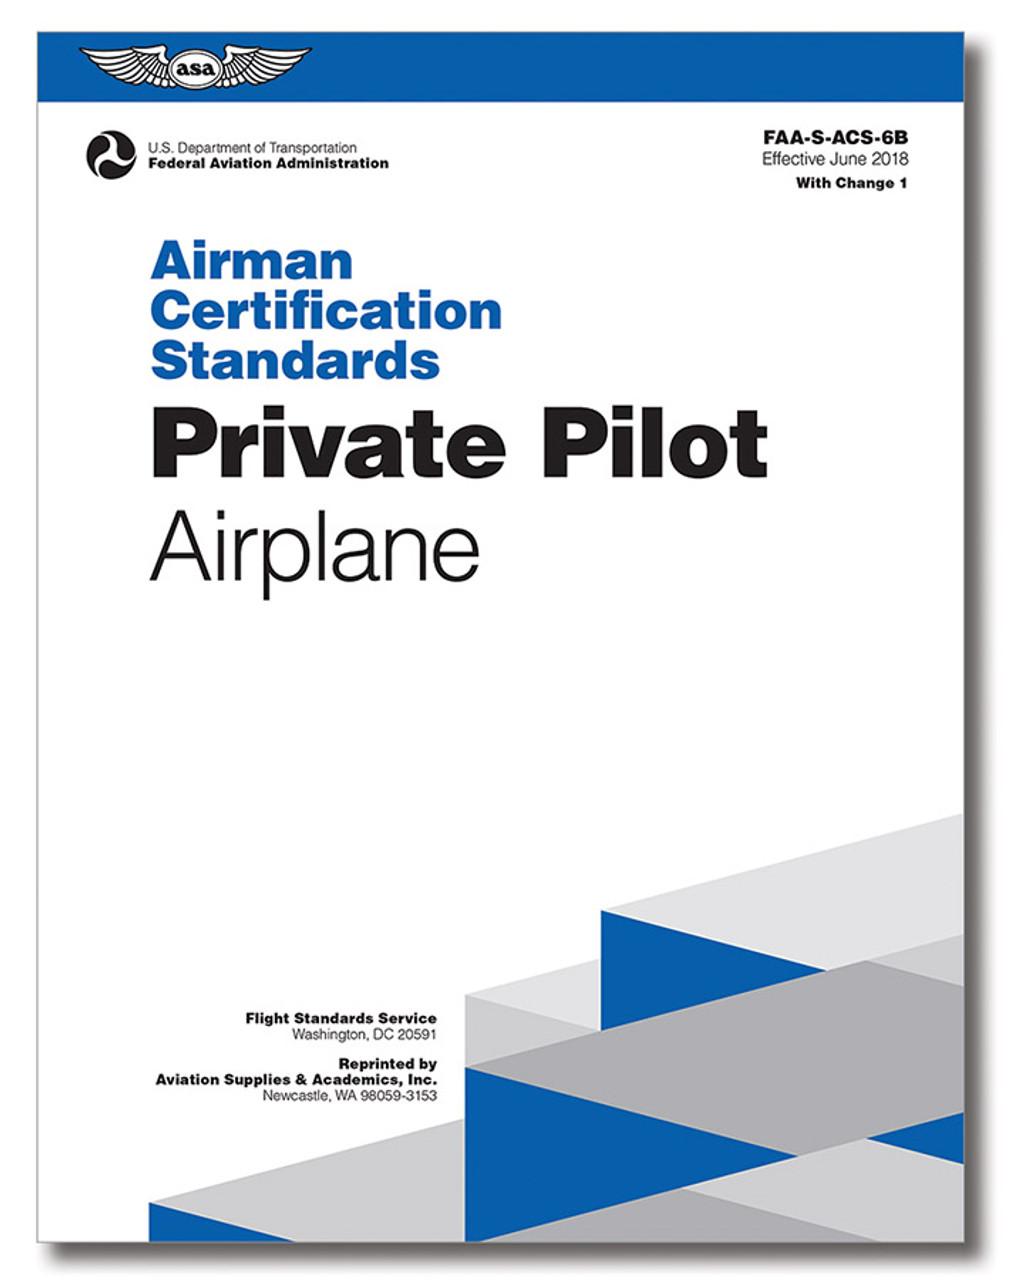 ASA Airman Certification Standards: Private Pilot Airplane 6B.1